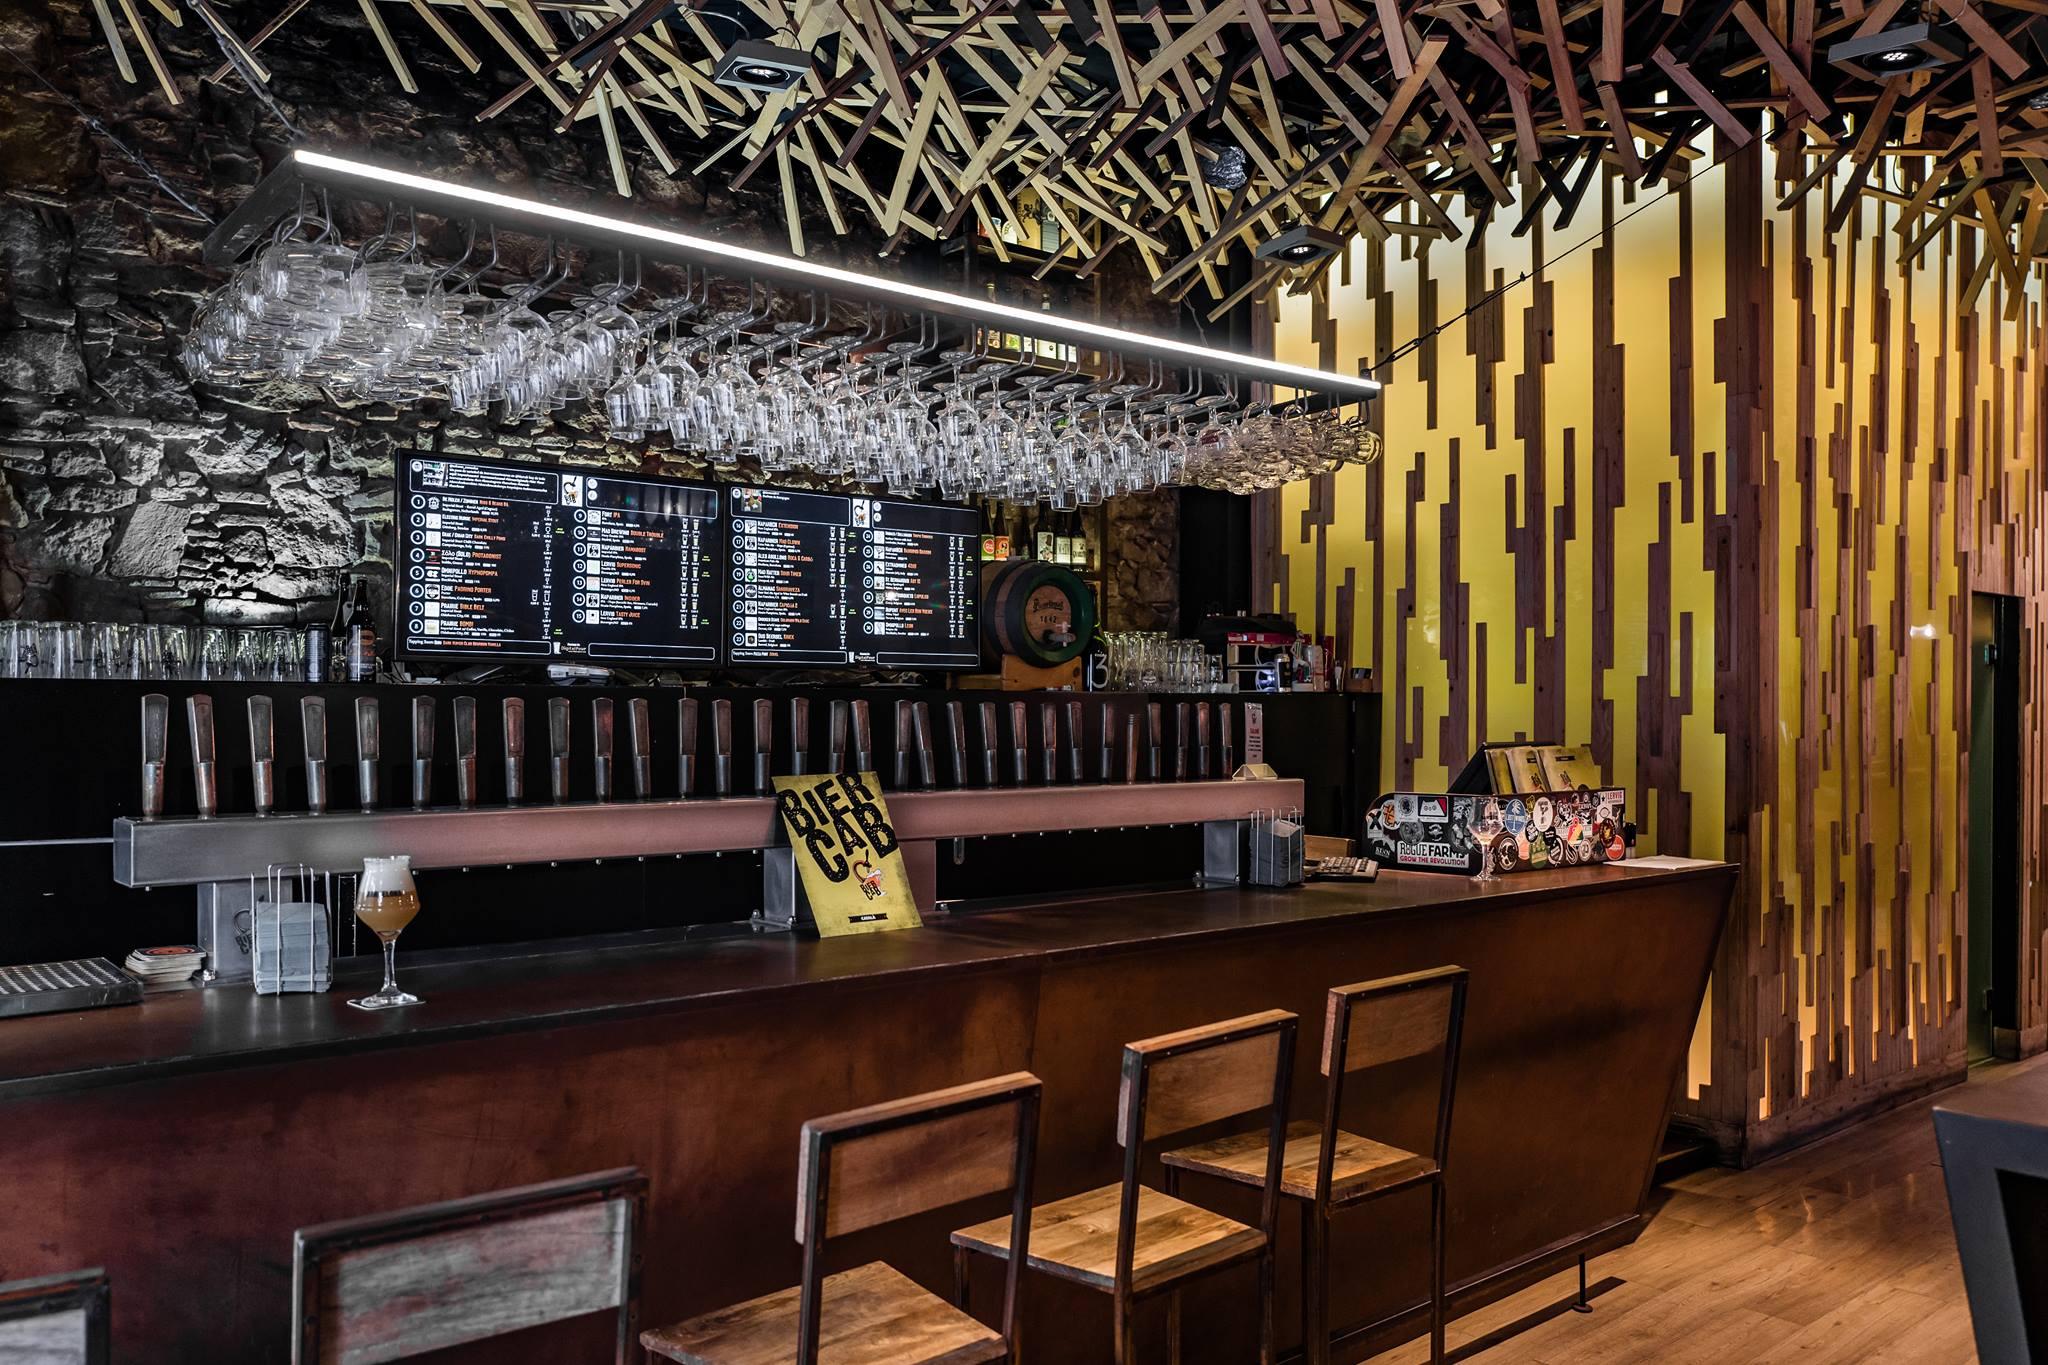 Top 5 Craft Beer Bars In Europe The Coolest Hotspots Beerwulf